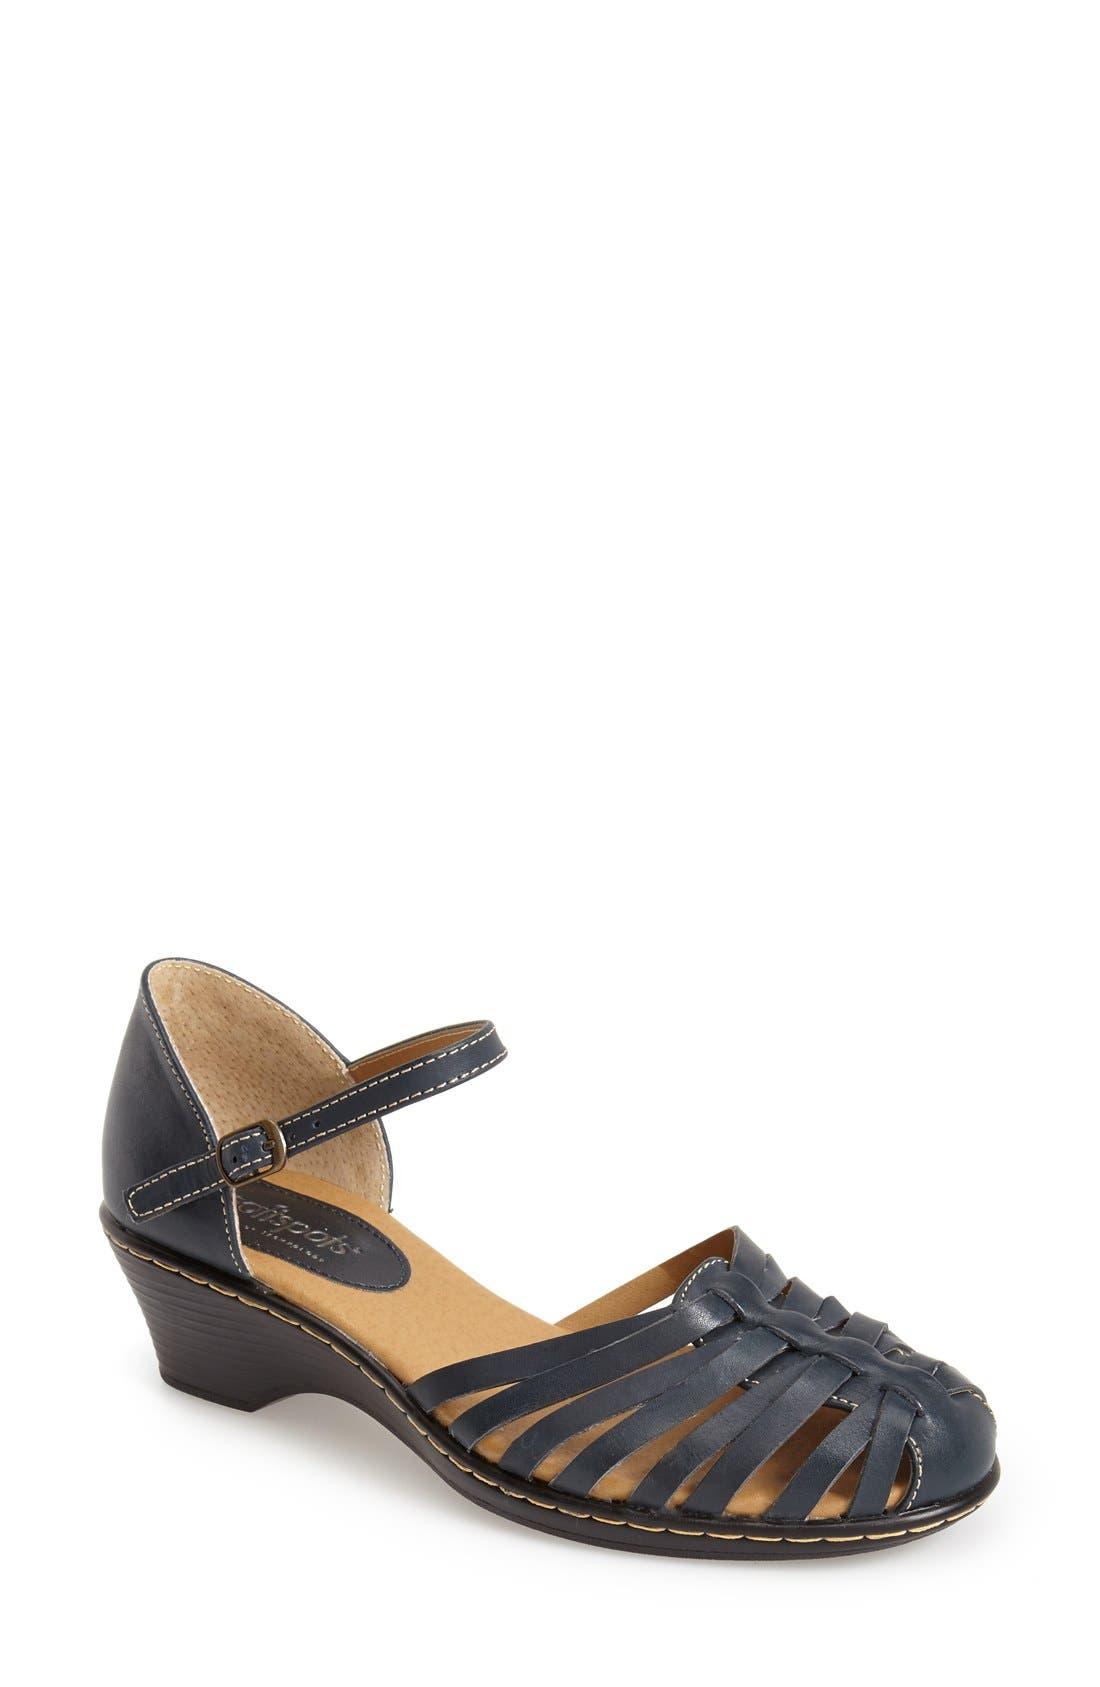 Main Image - Softspots 'Tatianna' Sandal